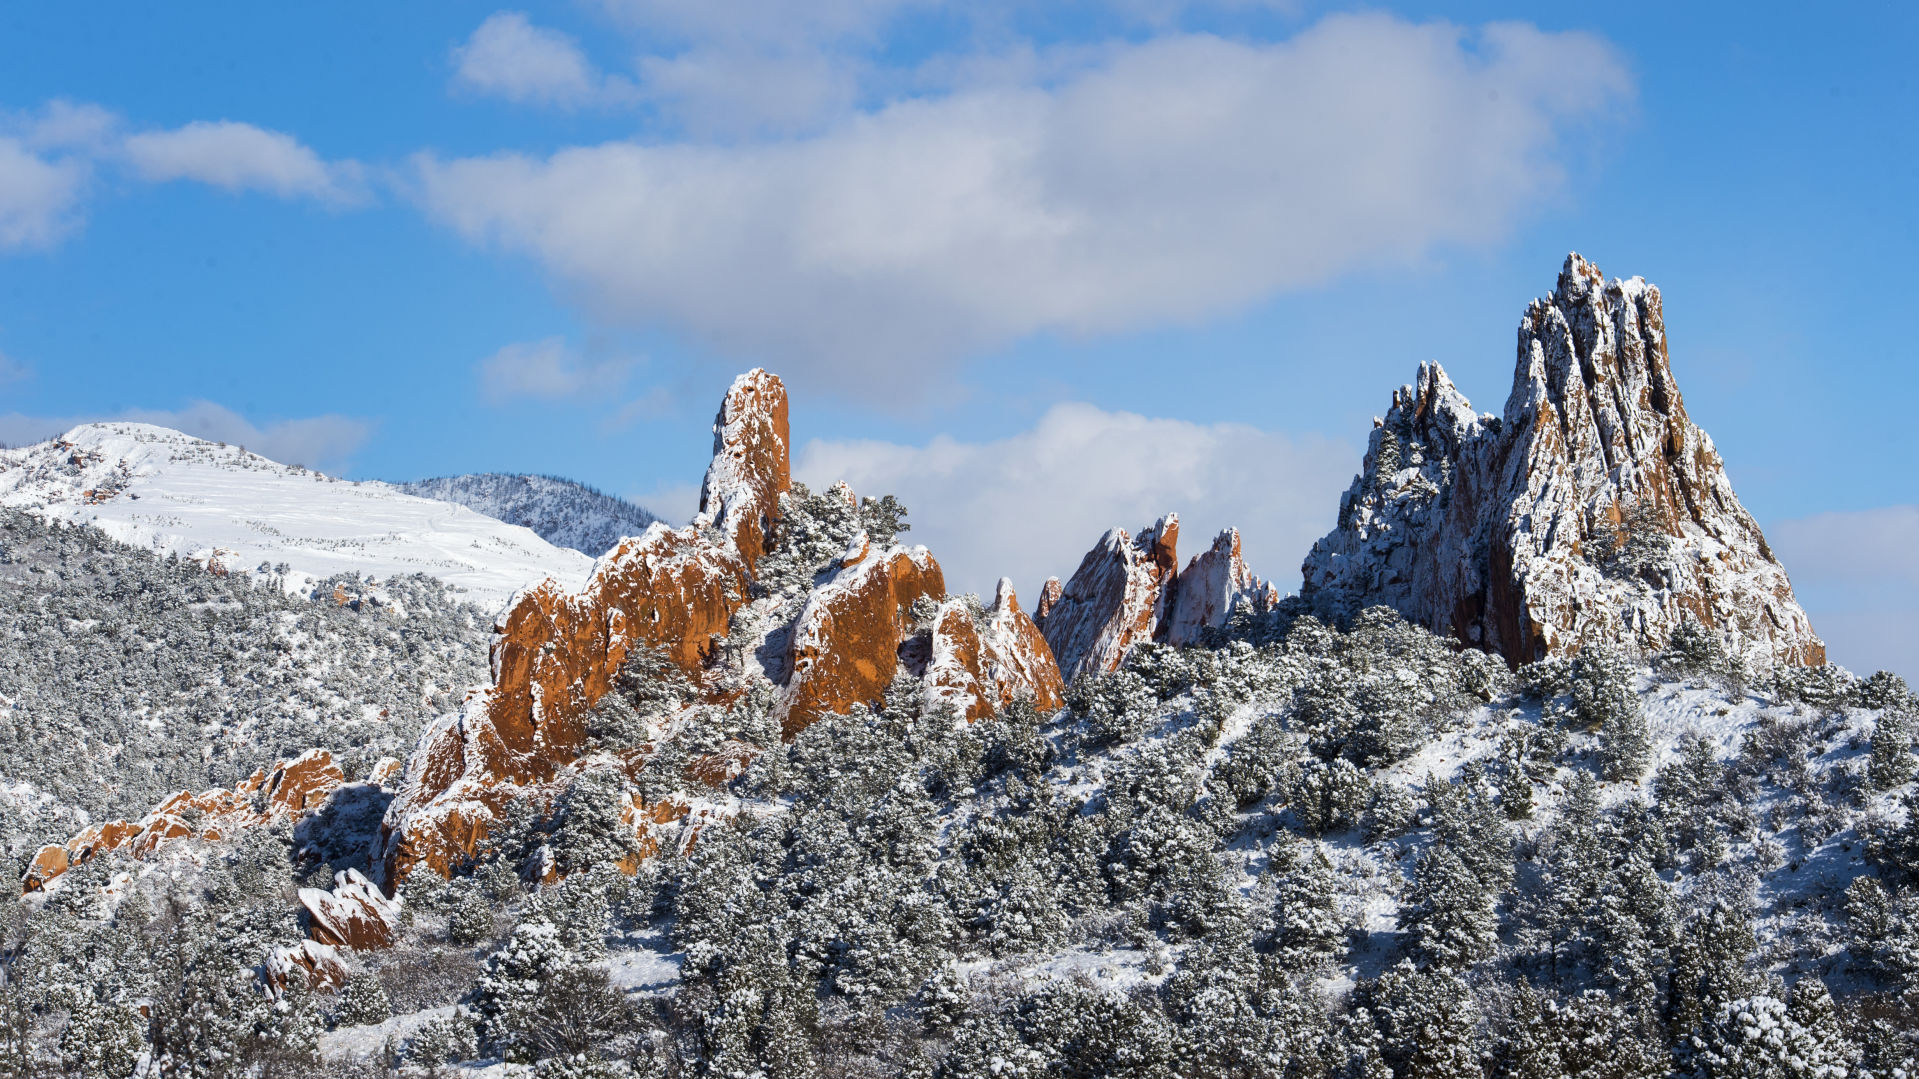 Snow clobbers Pikes Peak region, canceling schools and